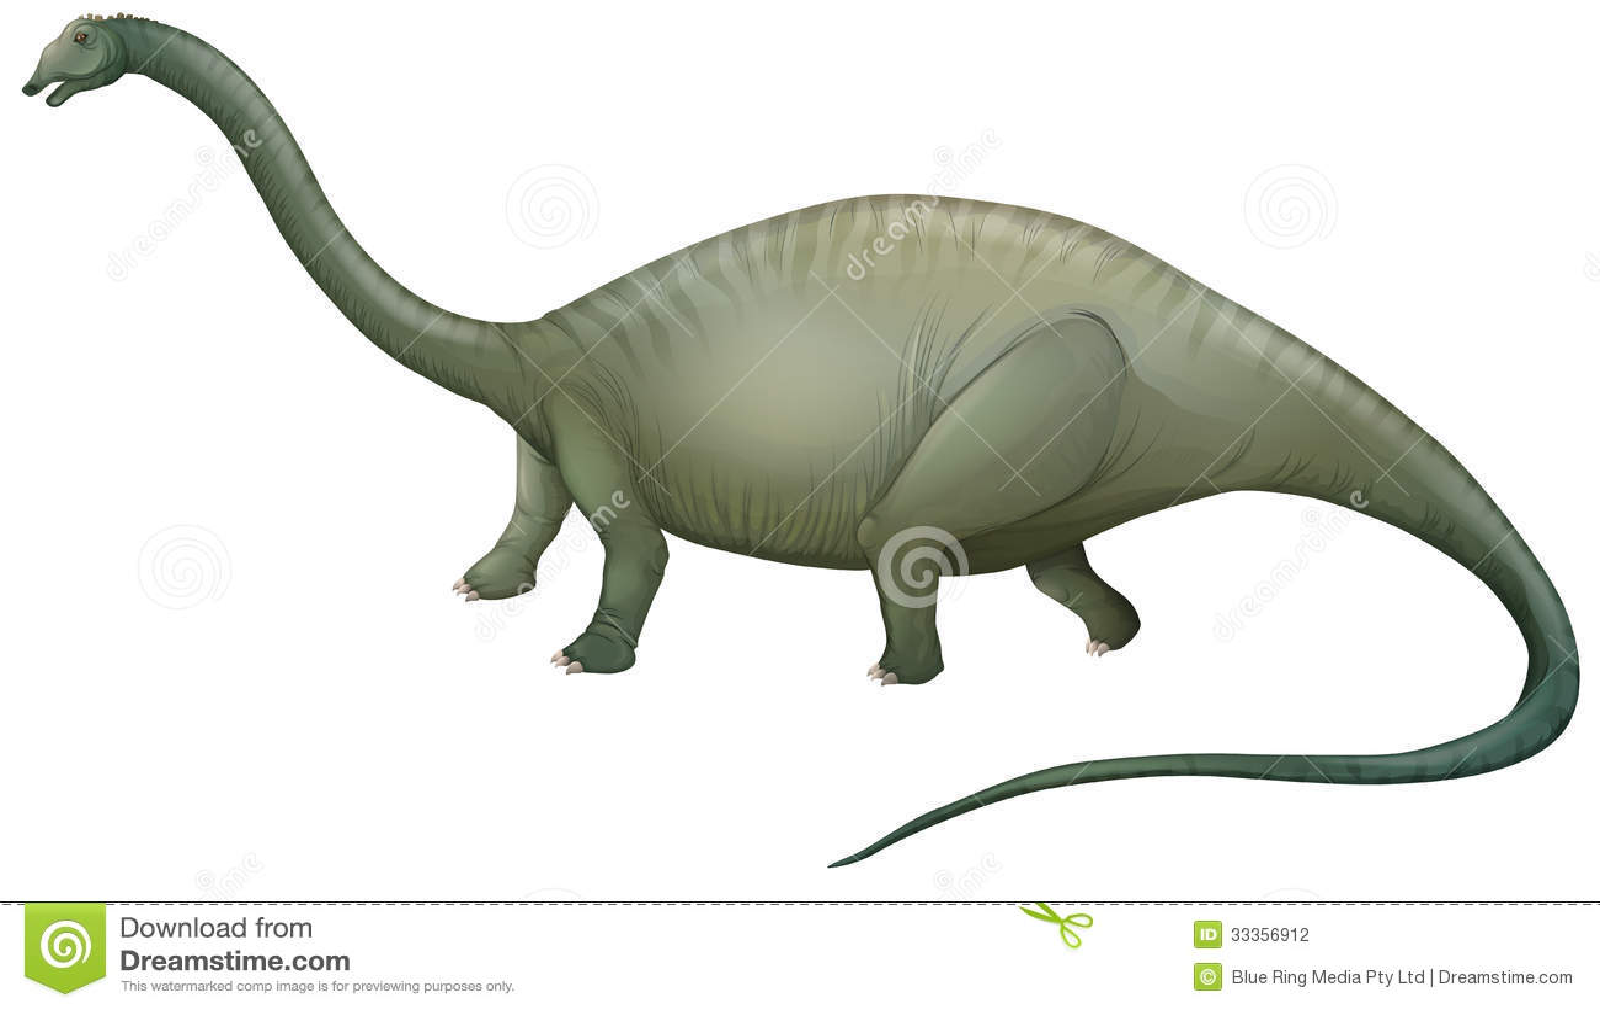 Displaying 20 gt images for herbivore dinosaurs herbivore teeth